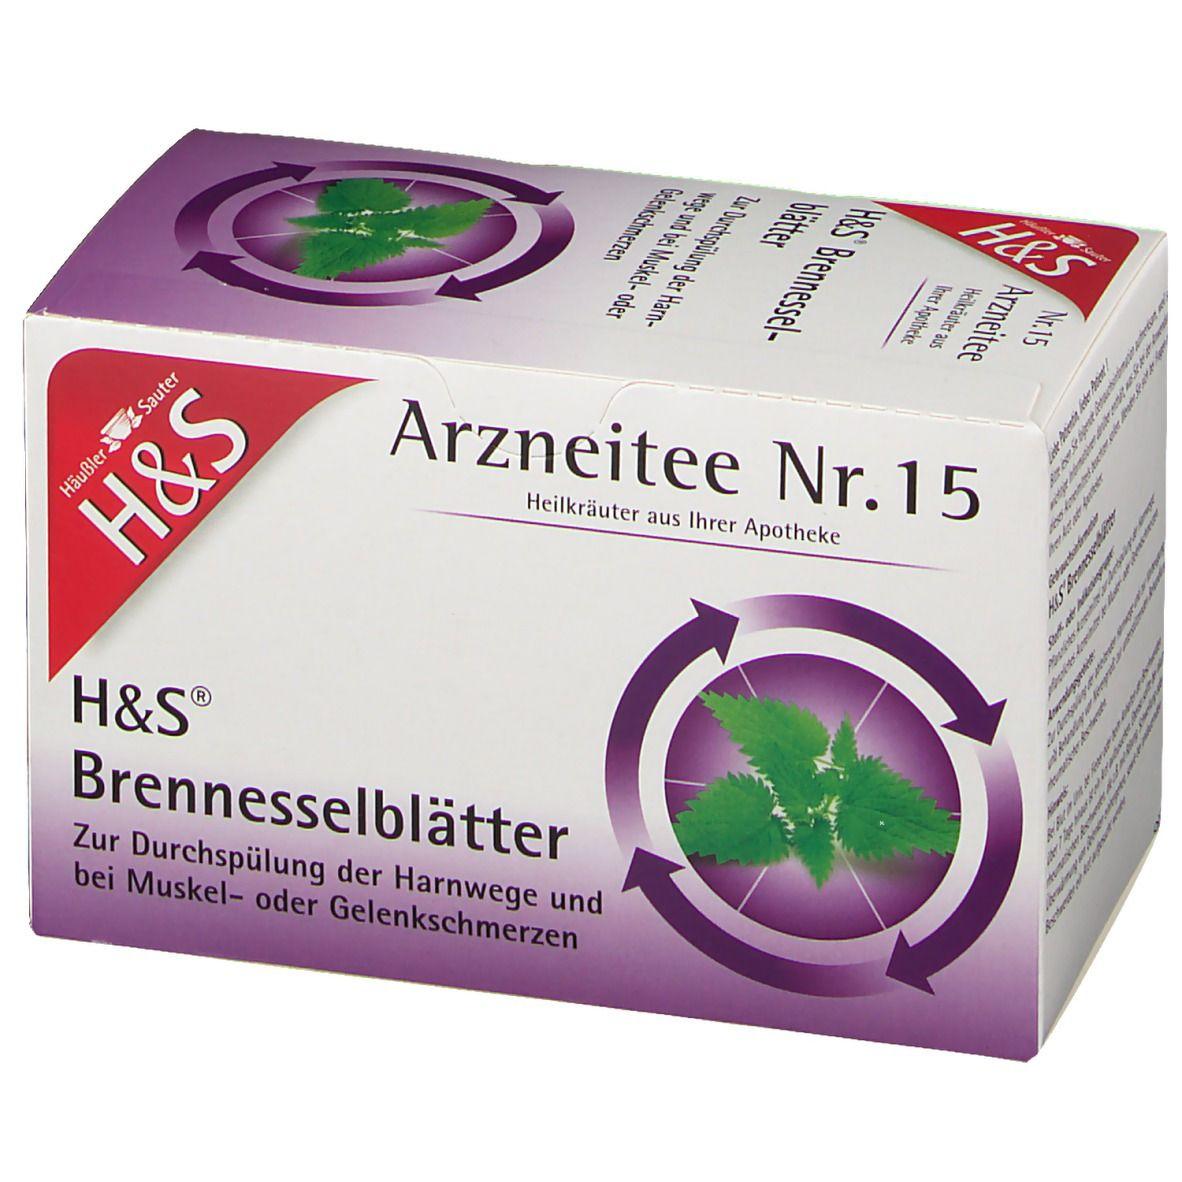 H&S Brennesselkraut Nr. 15 20X1.6 g - shop-apotheke.com